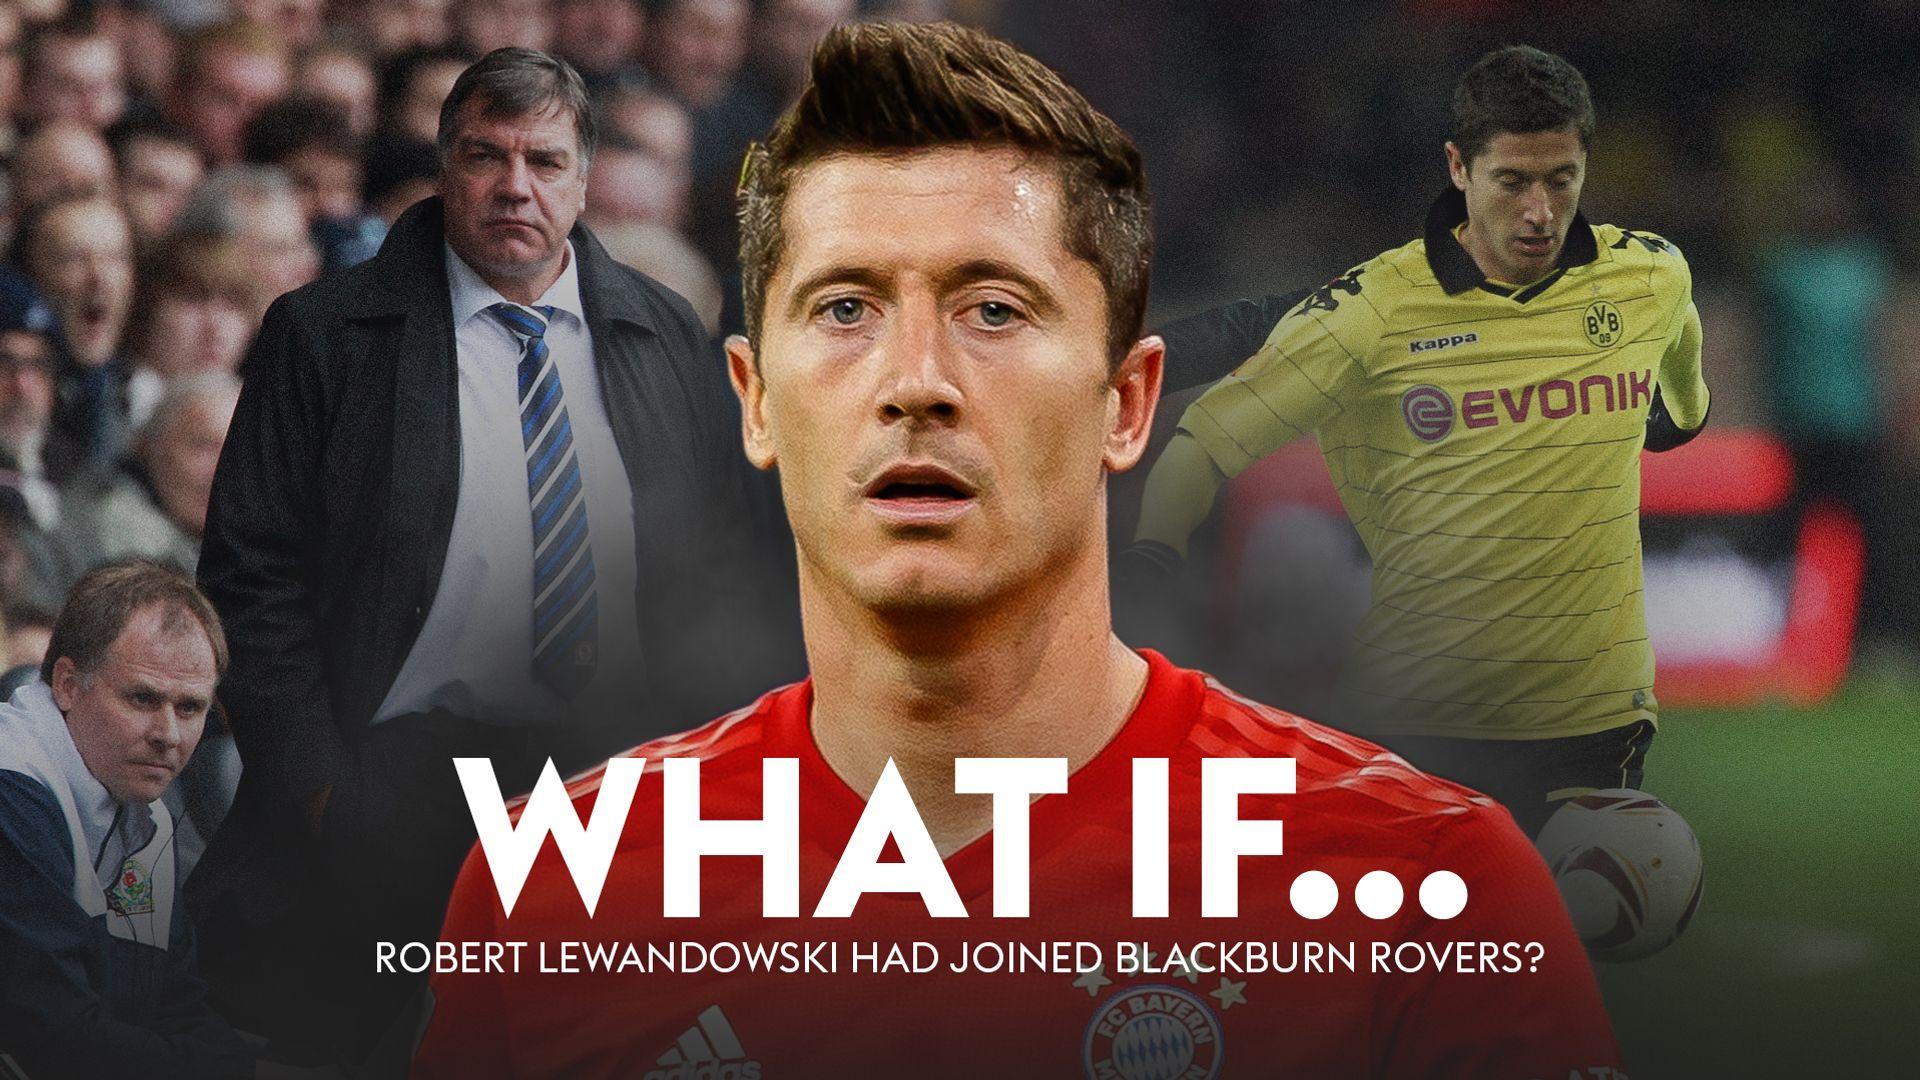 What if Lewandowski joined Big Sam at Blackburn?